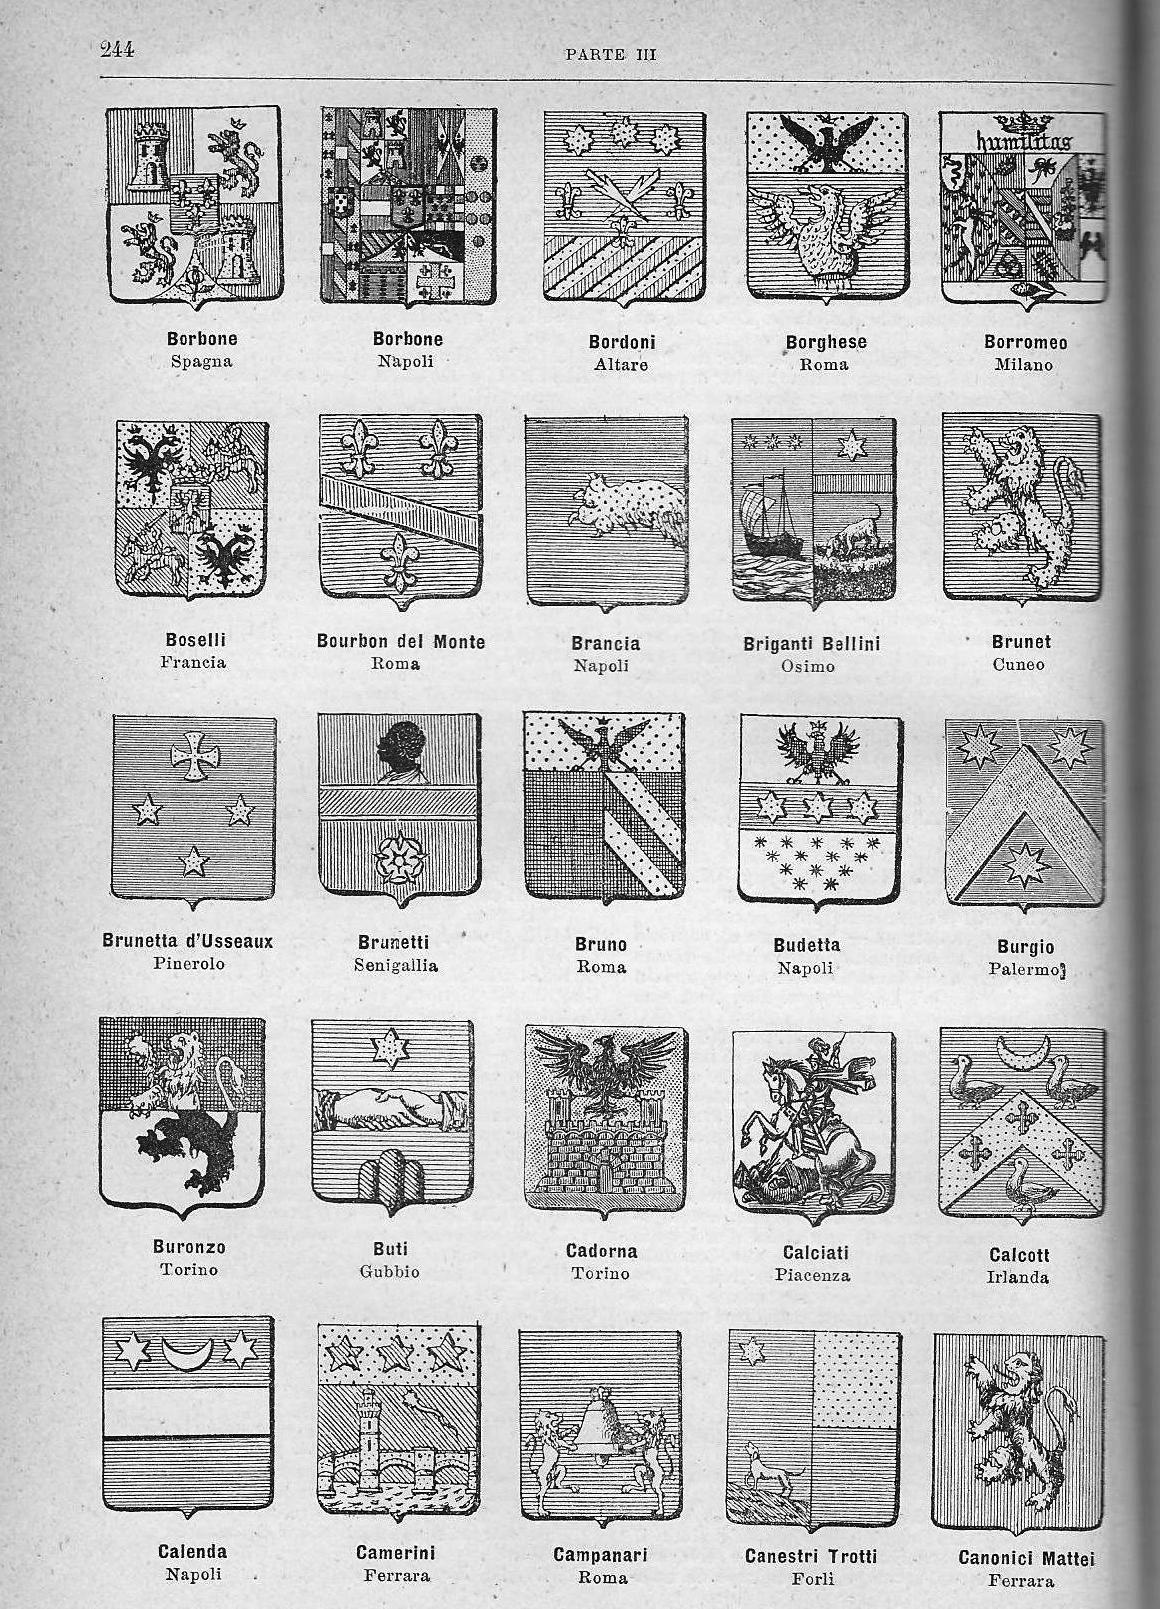 Calendario 1900.File Calendario D Oro 1900 Pagina 244 Jpg Wikimedia Commons